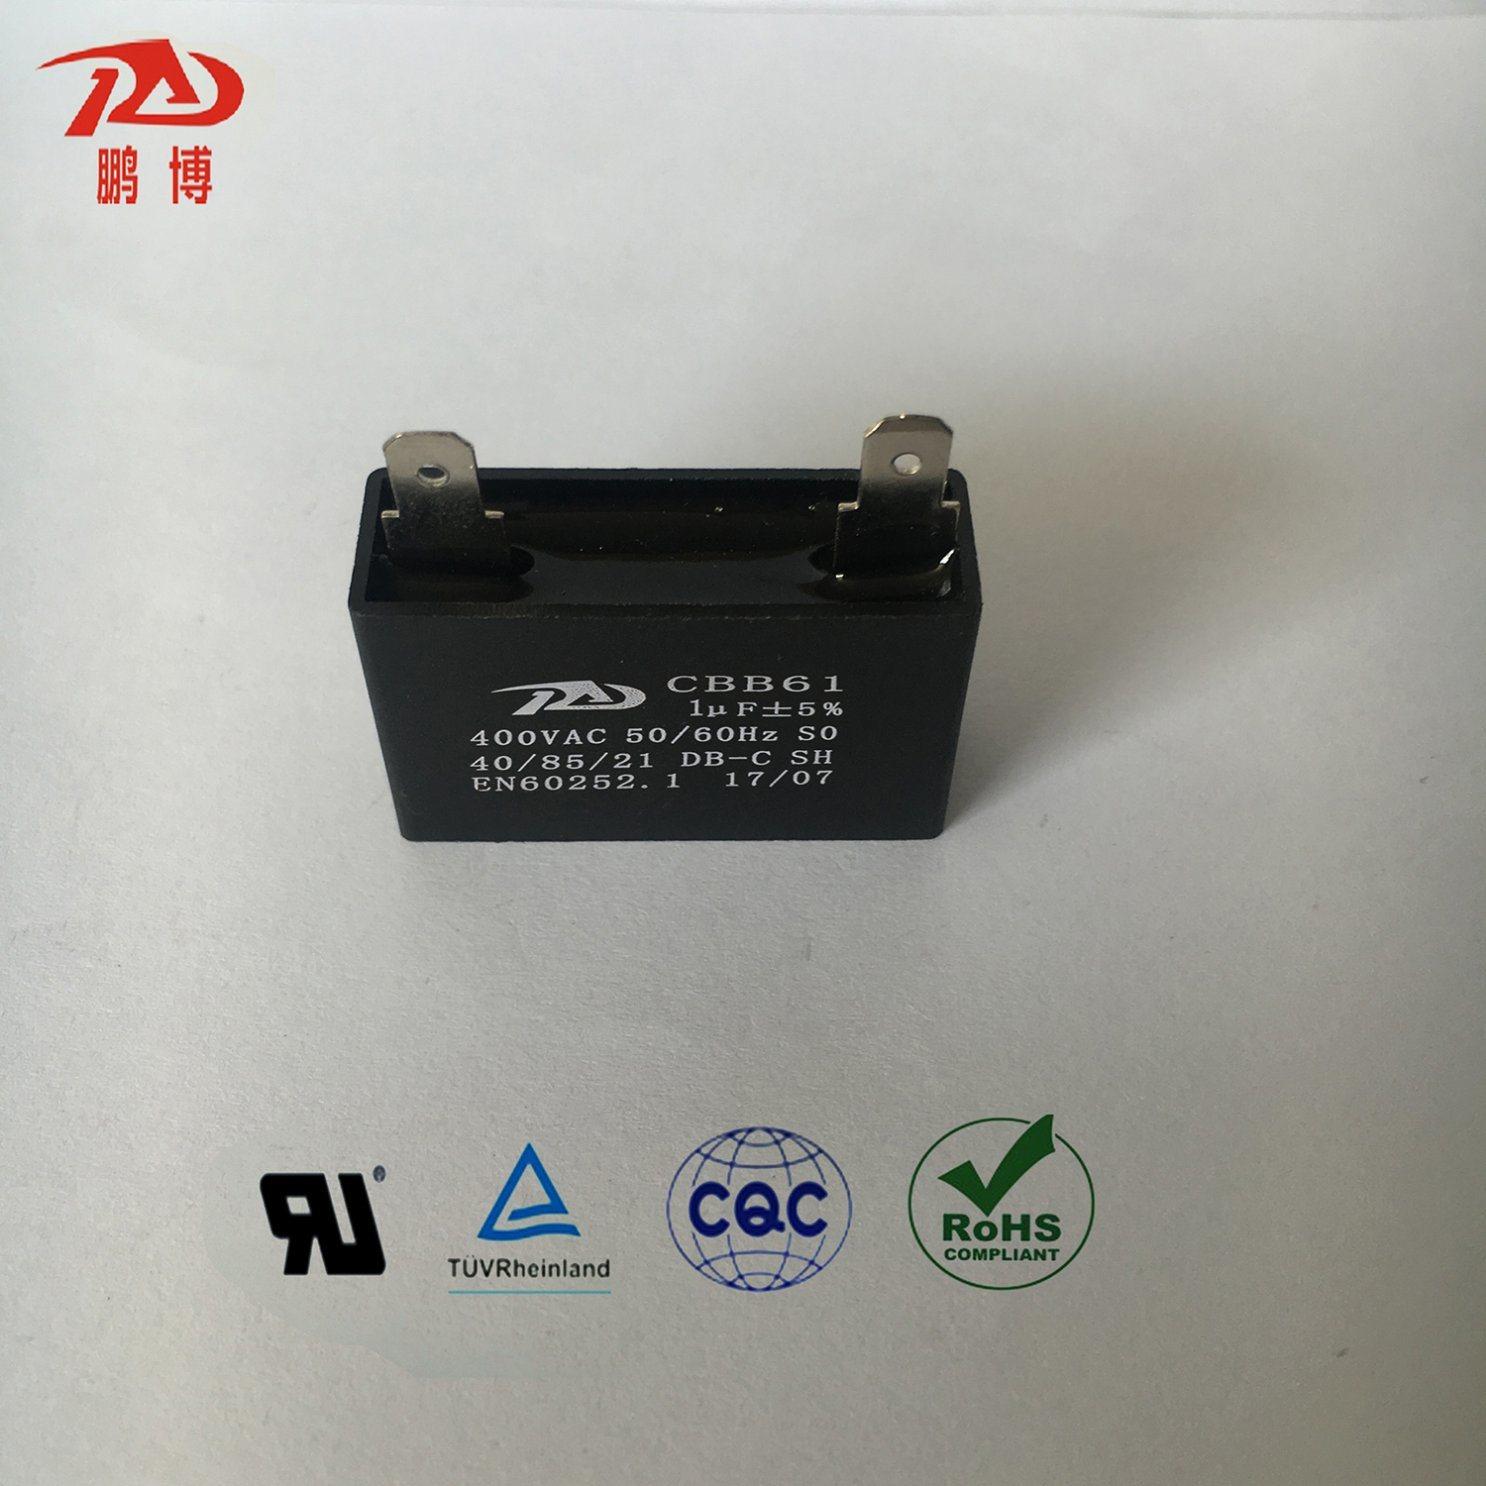 China Freezer Parts/Refrigerator- Cbb61 Wire Lead Cylinder Motor Run Sh  Capacitor (CBB61 1UF 400V) - China Cbb61, Freezers